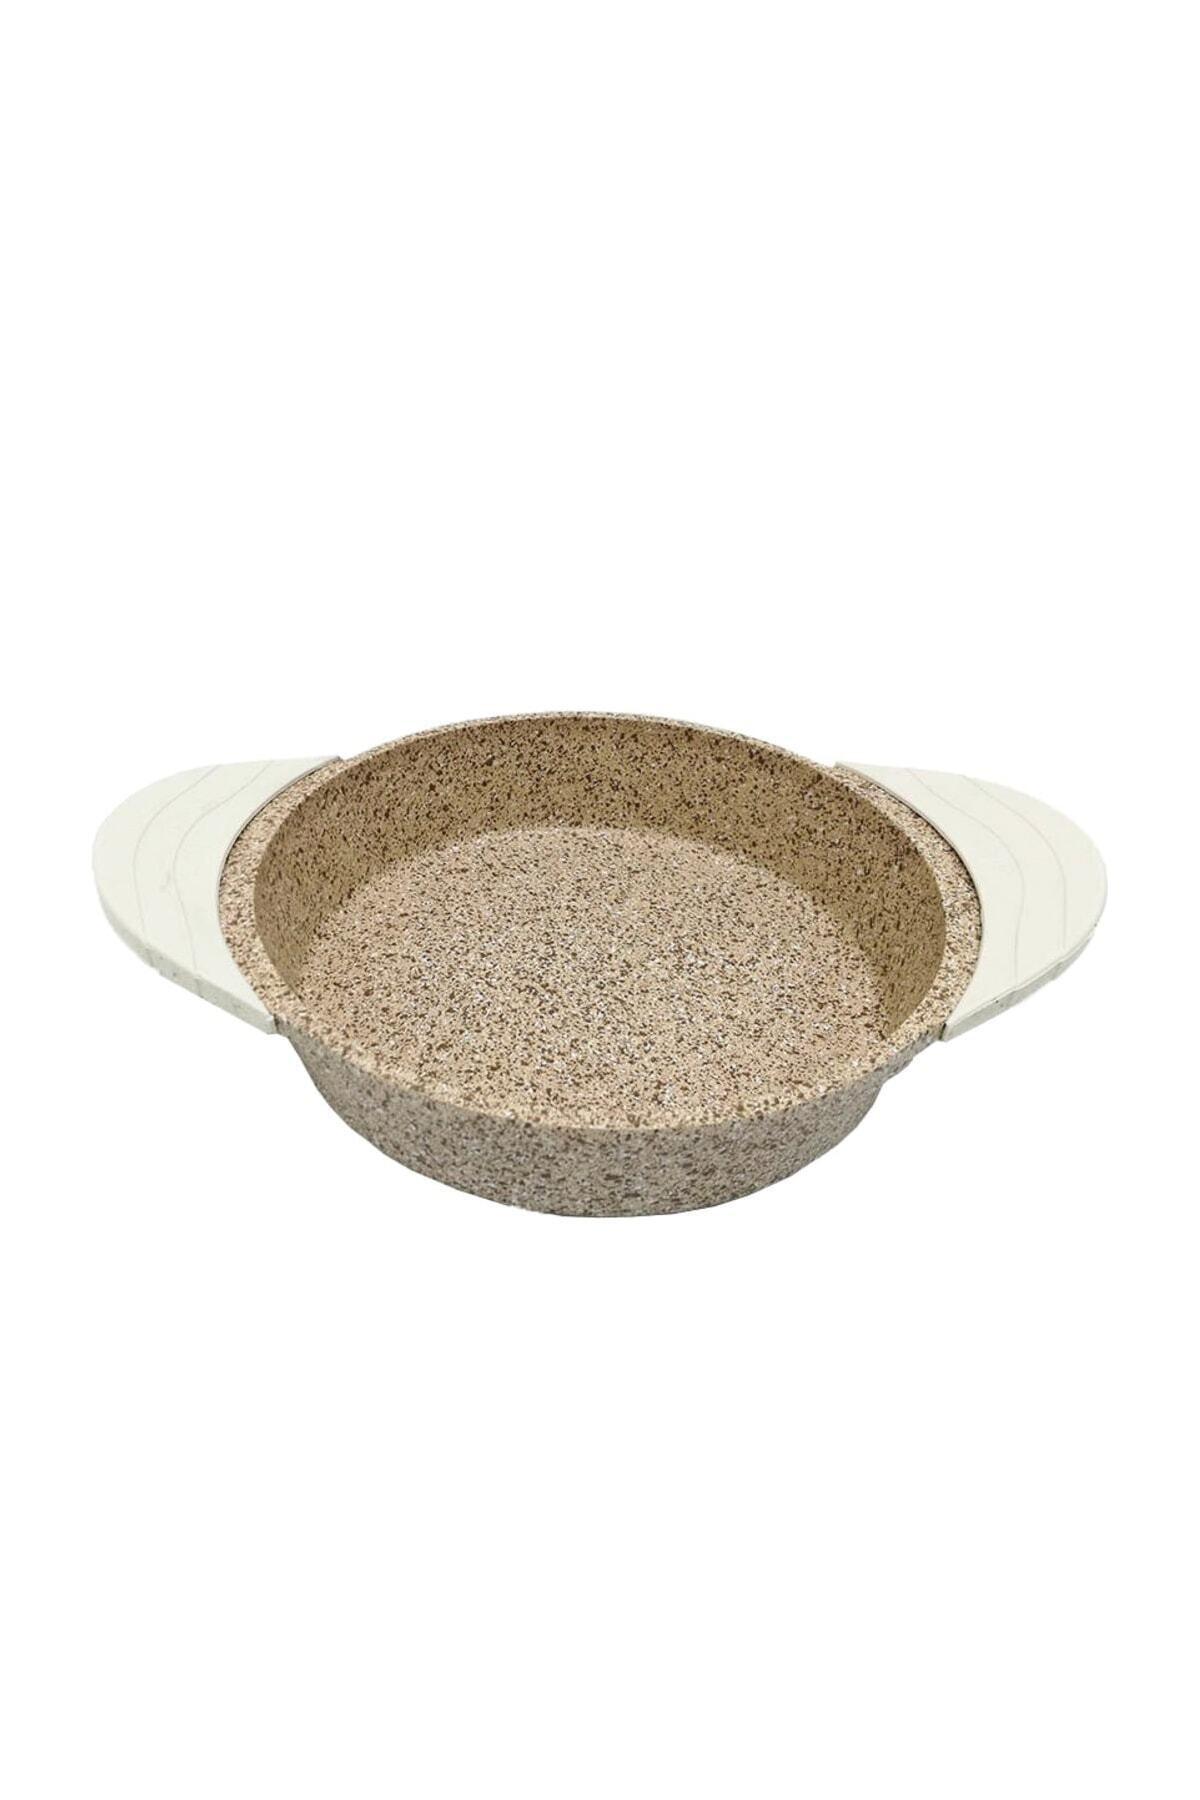 Doacast Creamy 22 Cm Döküm Granit Sahan Tava